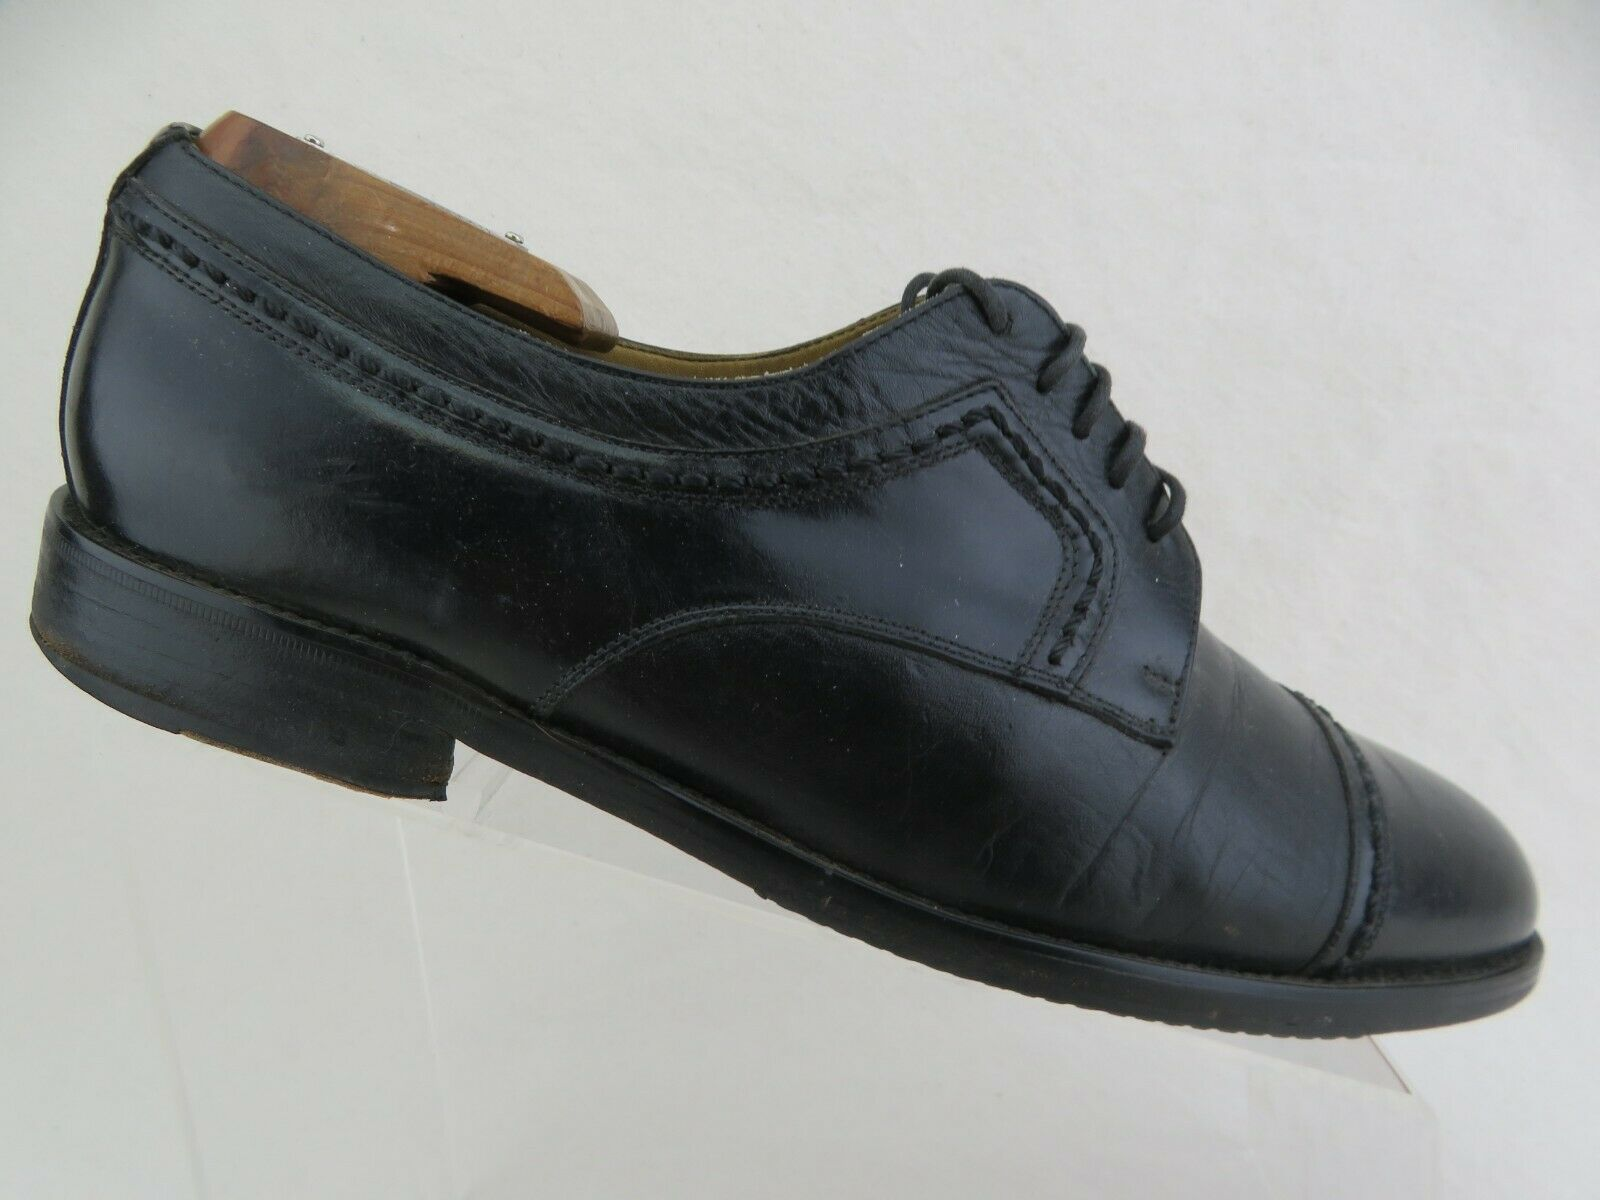 JOHNSTON & MURPHY Pantera Black Sz 9.5 W Wide Men Cap-Toe Derby Dress Shoes